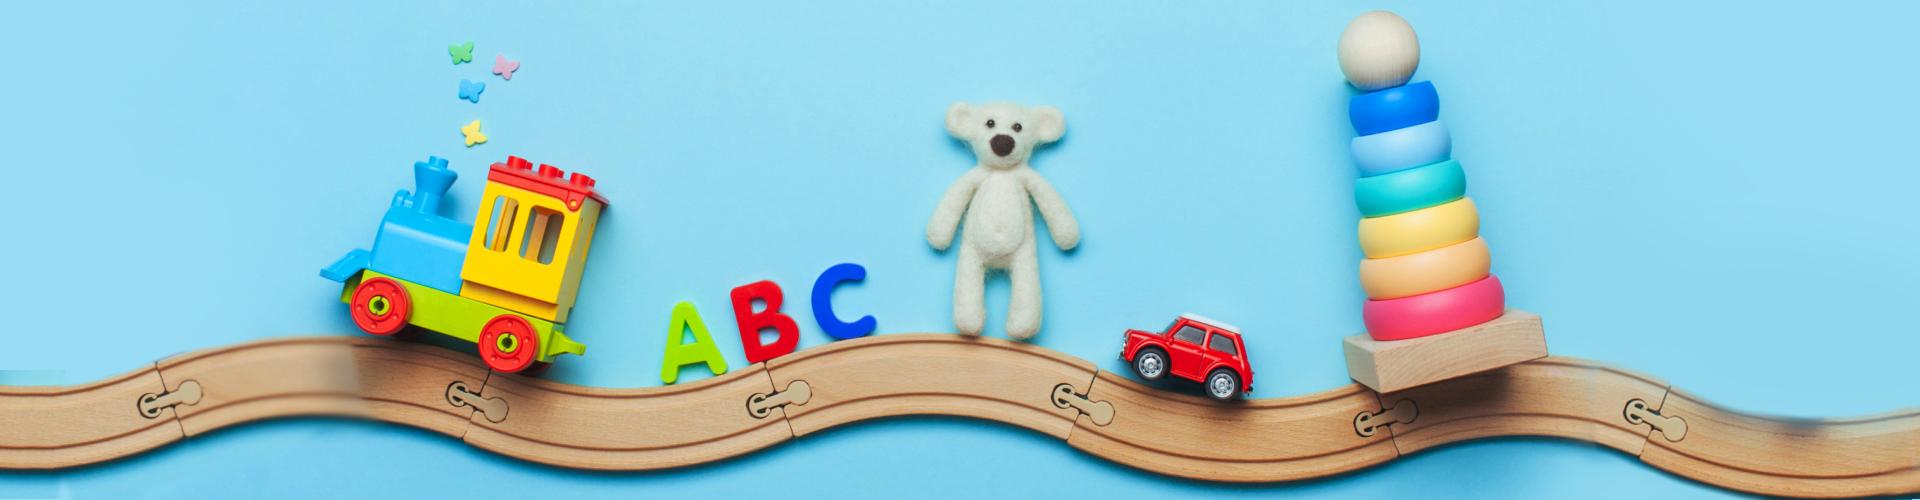 daycare art concept